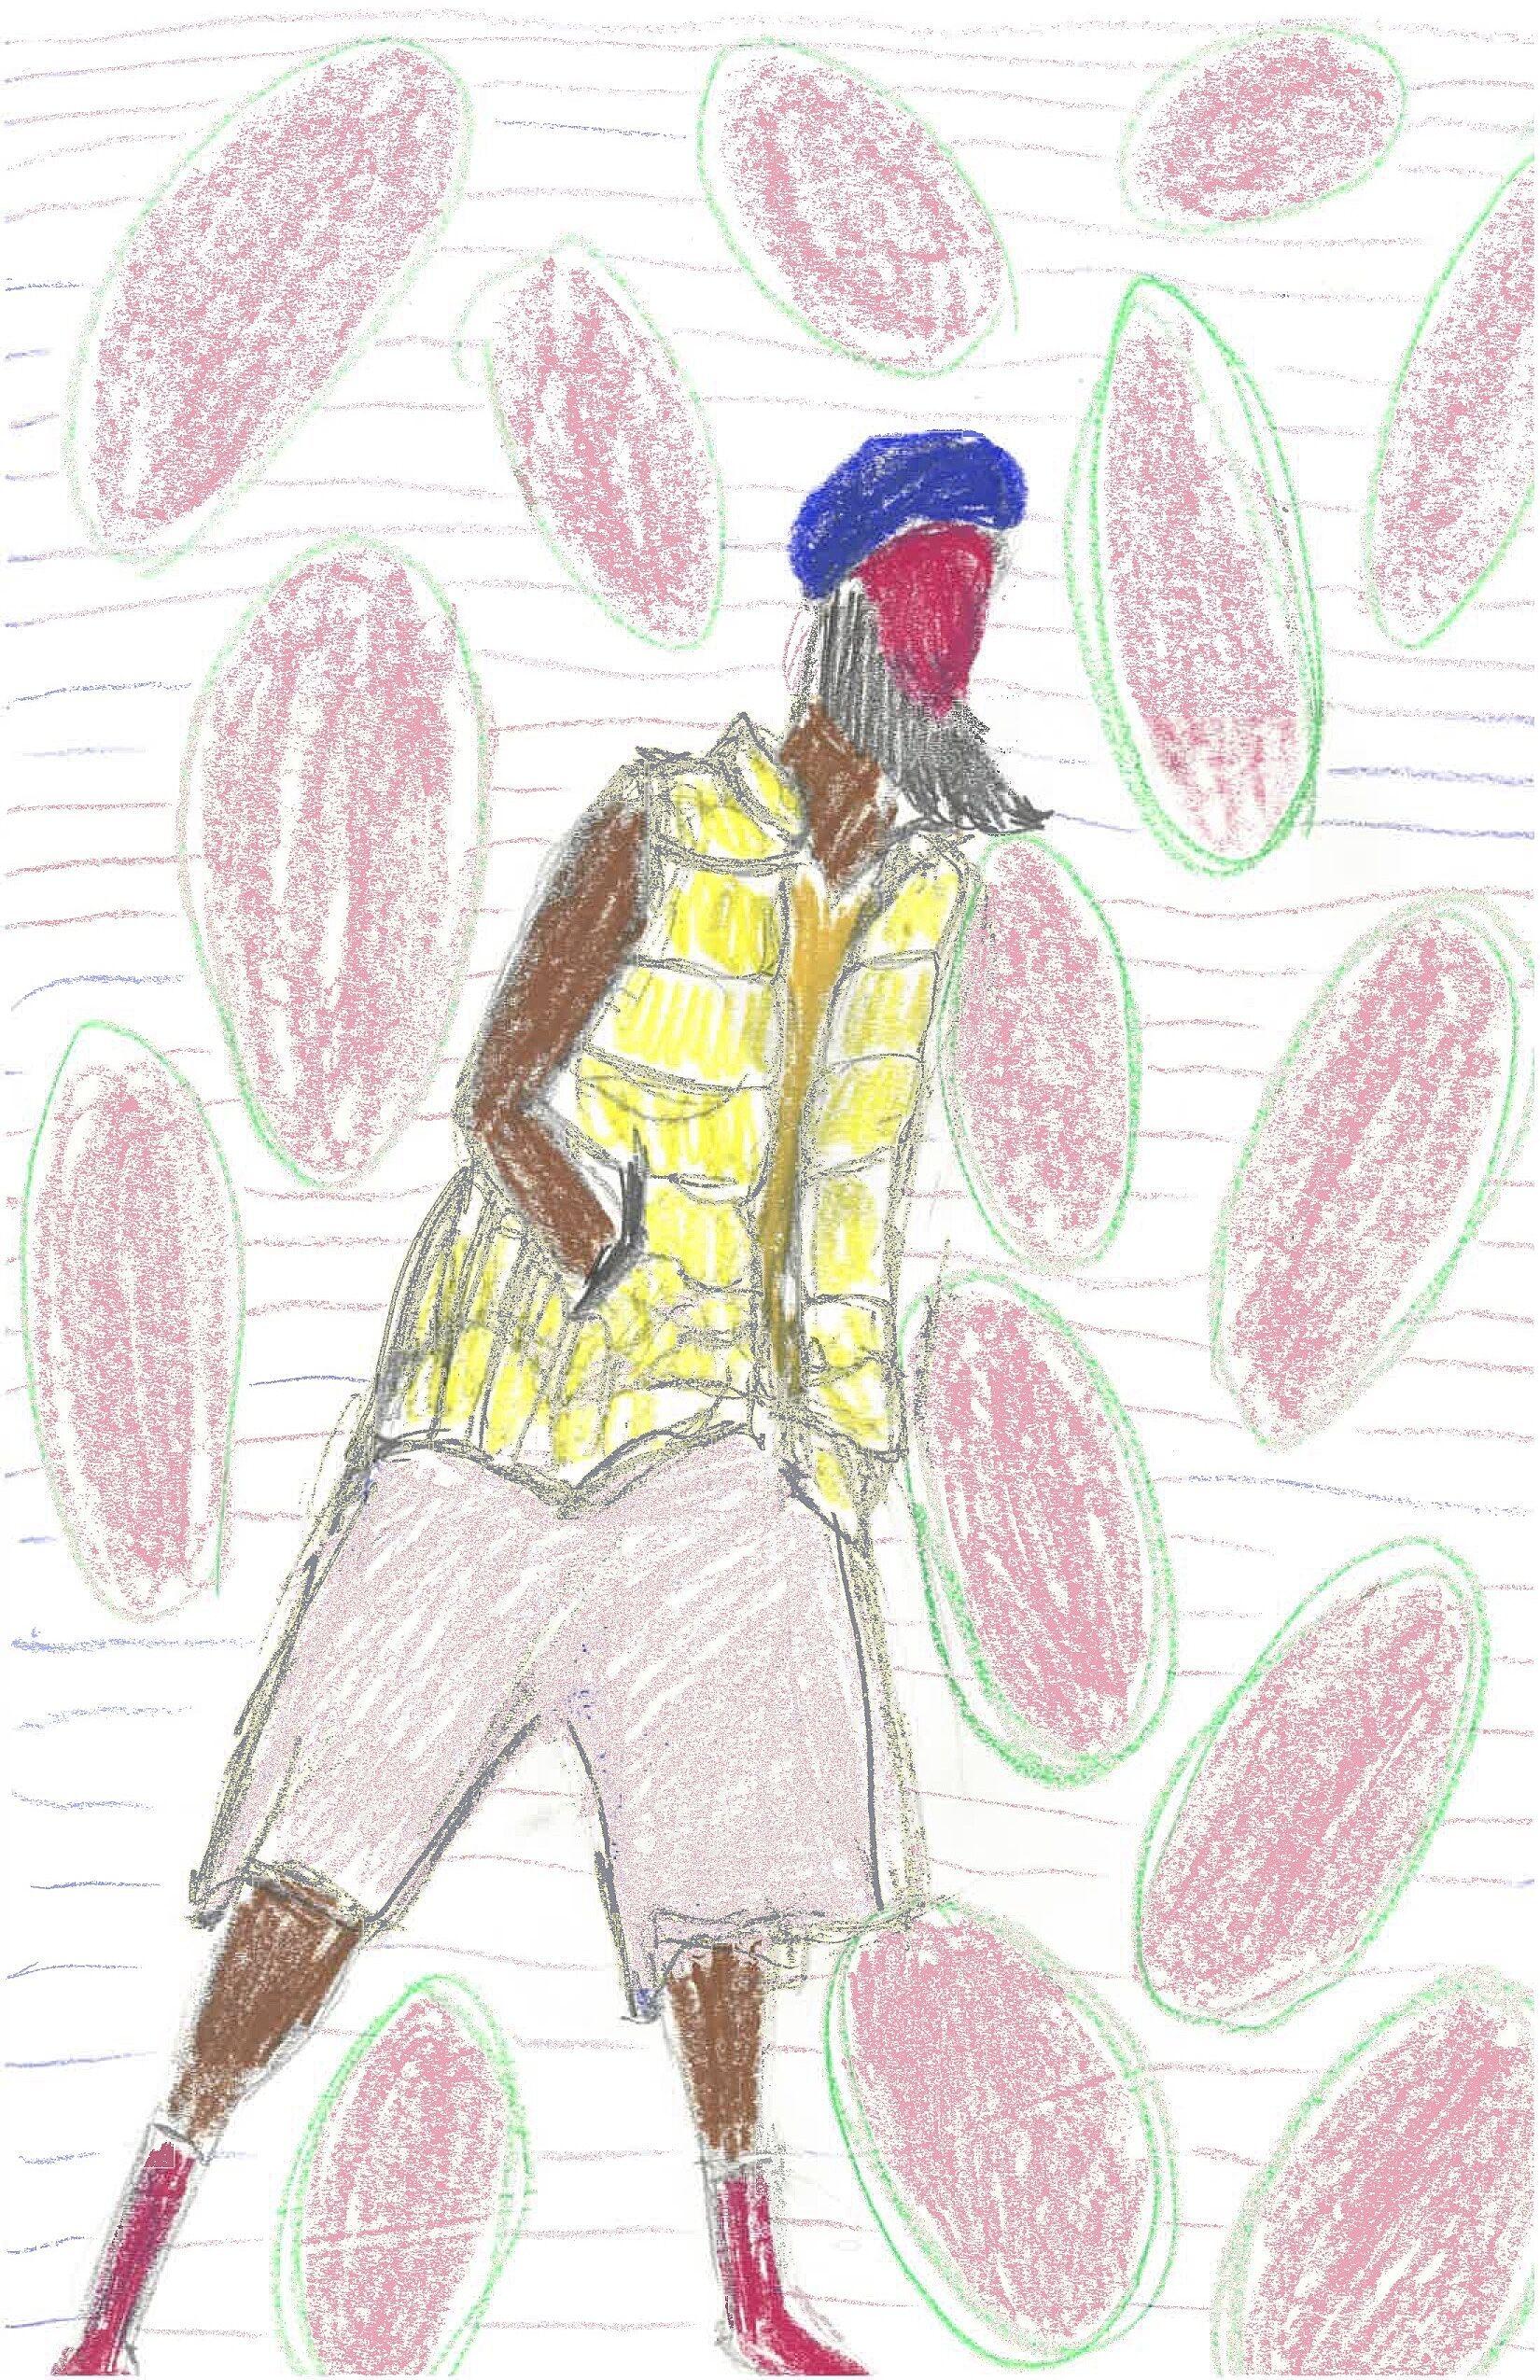 Child's sketch.